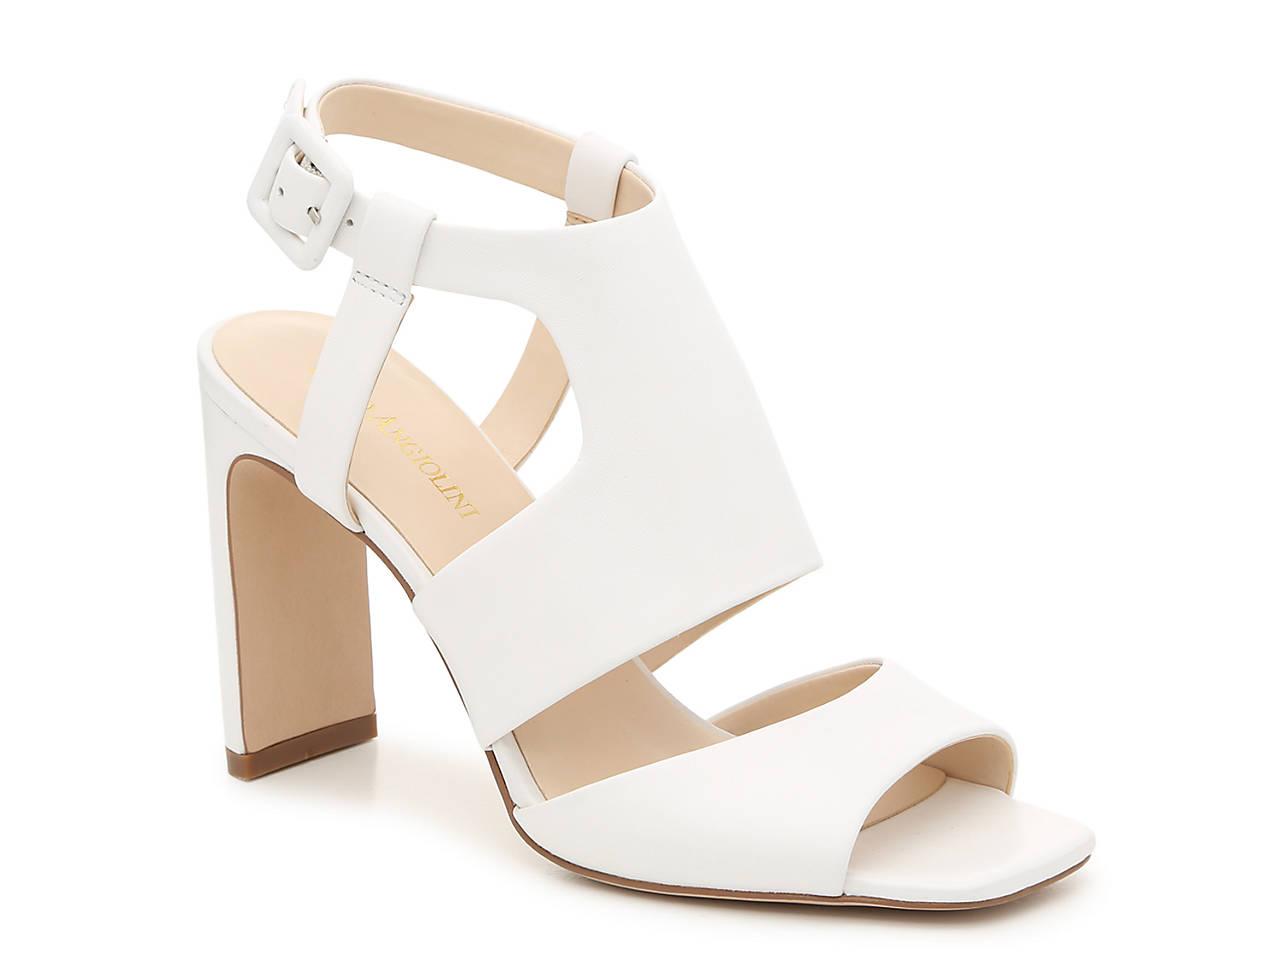 62cc490d17 Enzo Angiolini Trudy Sandal Women's Shoes | DSW